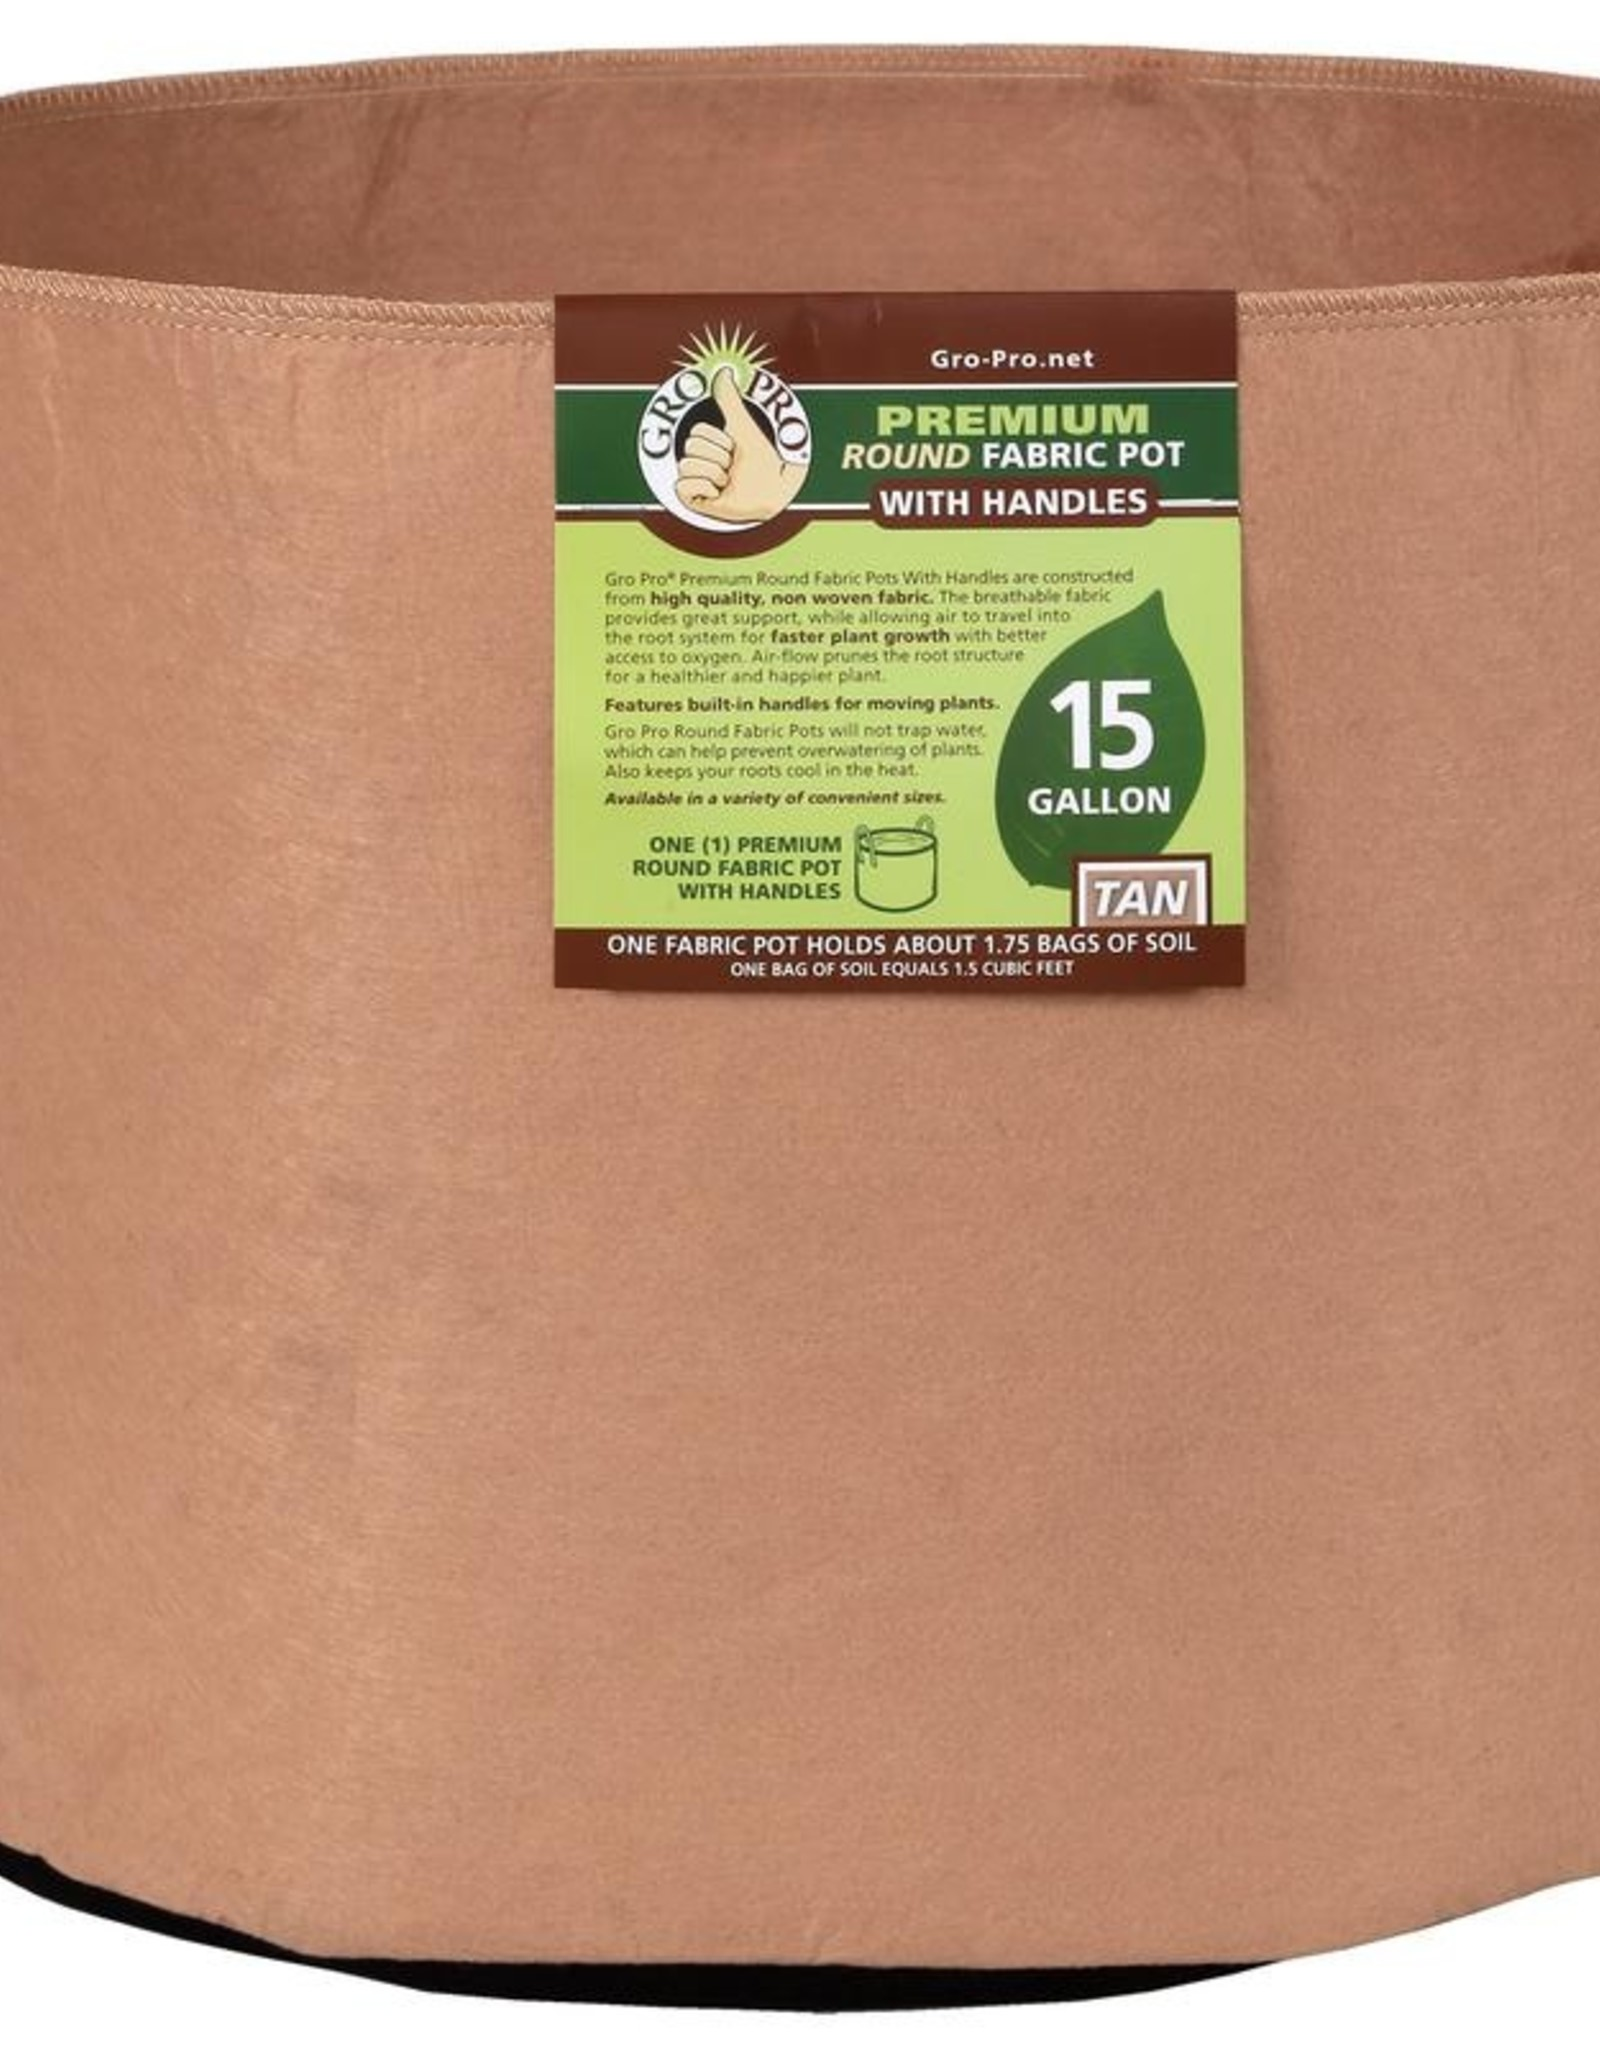 GRO PRO Gro Pro Premium Round Fabric Pot w/ Handles 15 Gallon - Tan